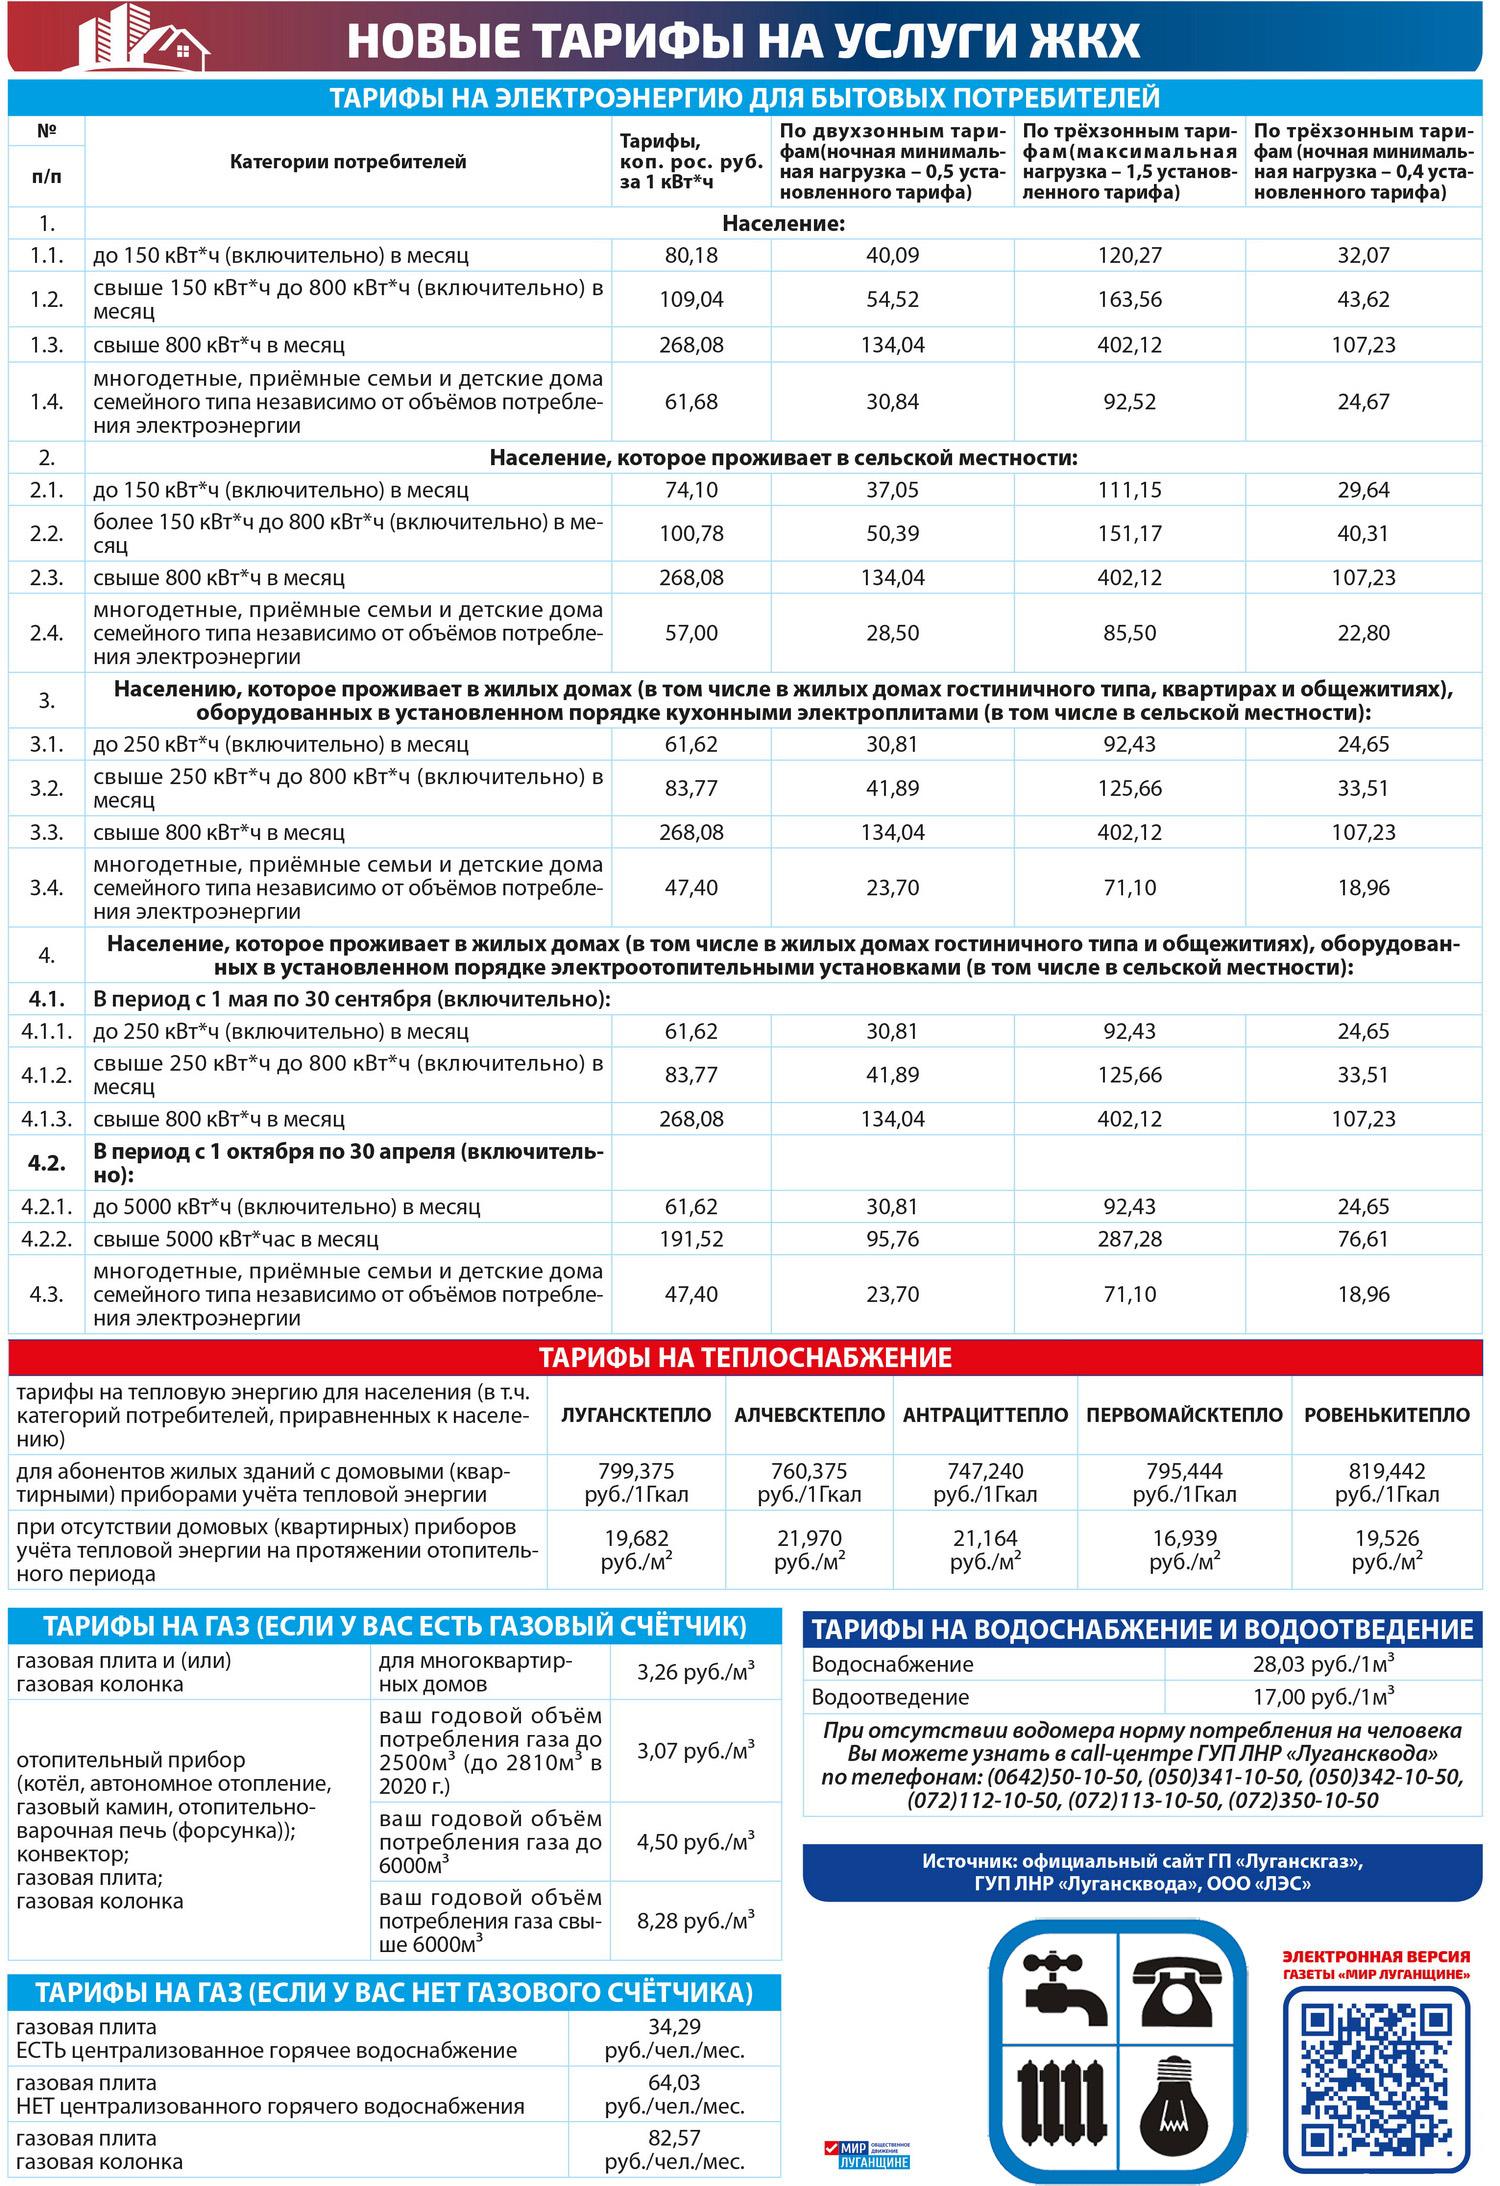 тарифы на услуги ЖКХ ЛНР